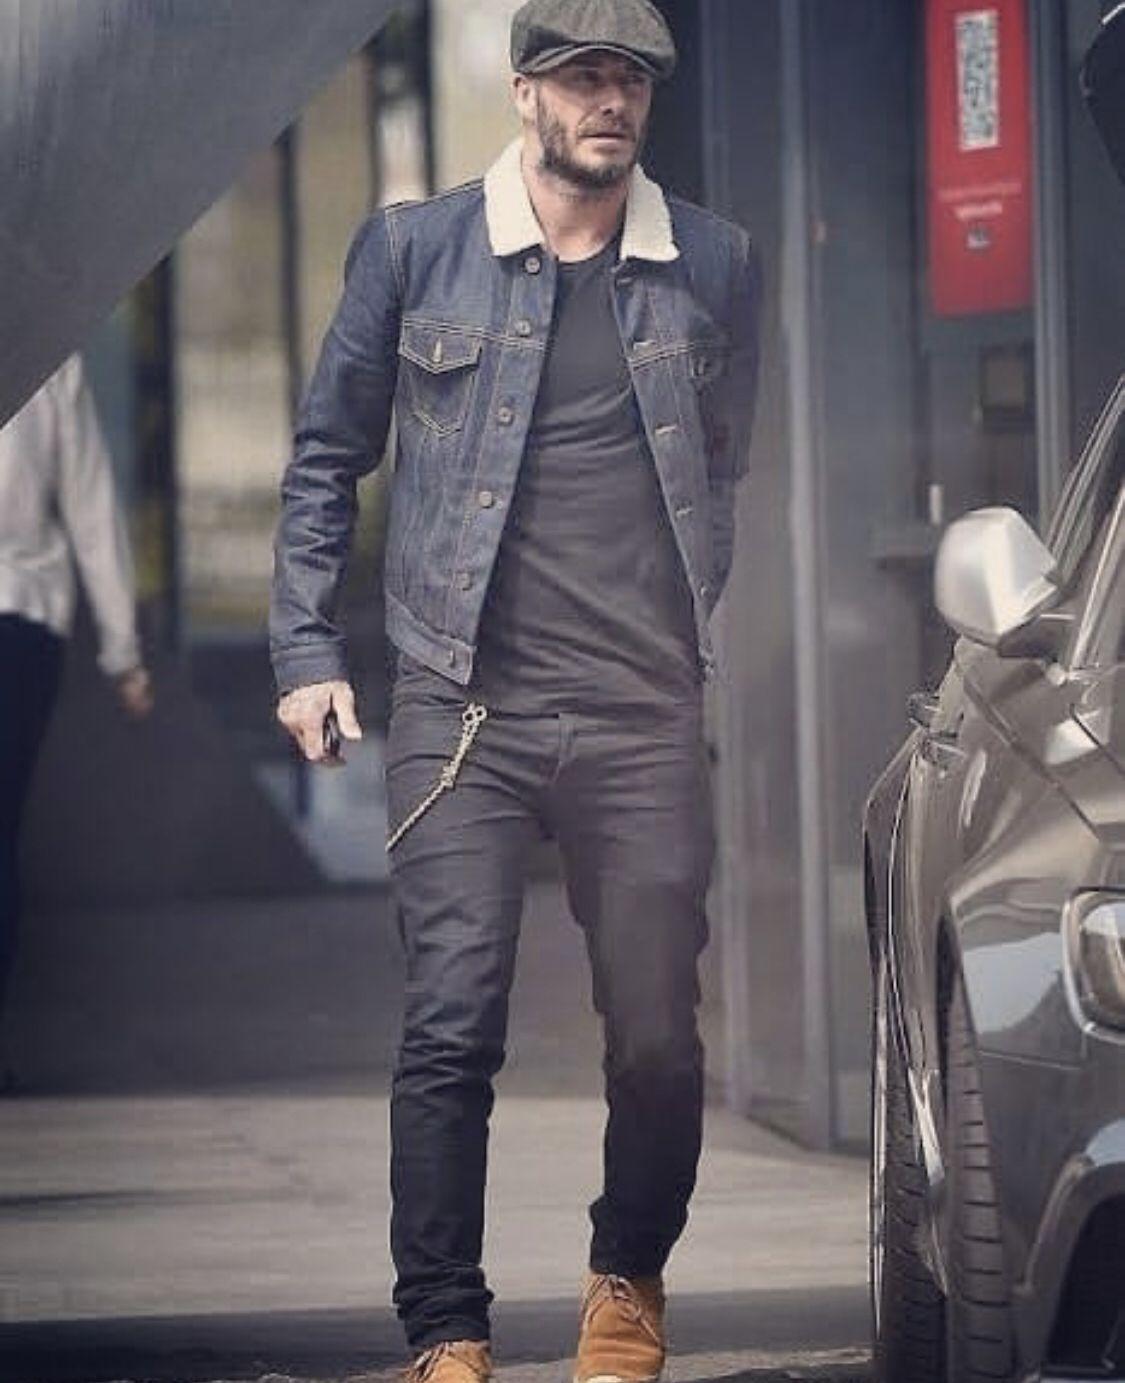 Men David Beckham Style Leather Sleeves Black Denim Jeans Casual wear Jacket